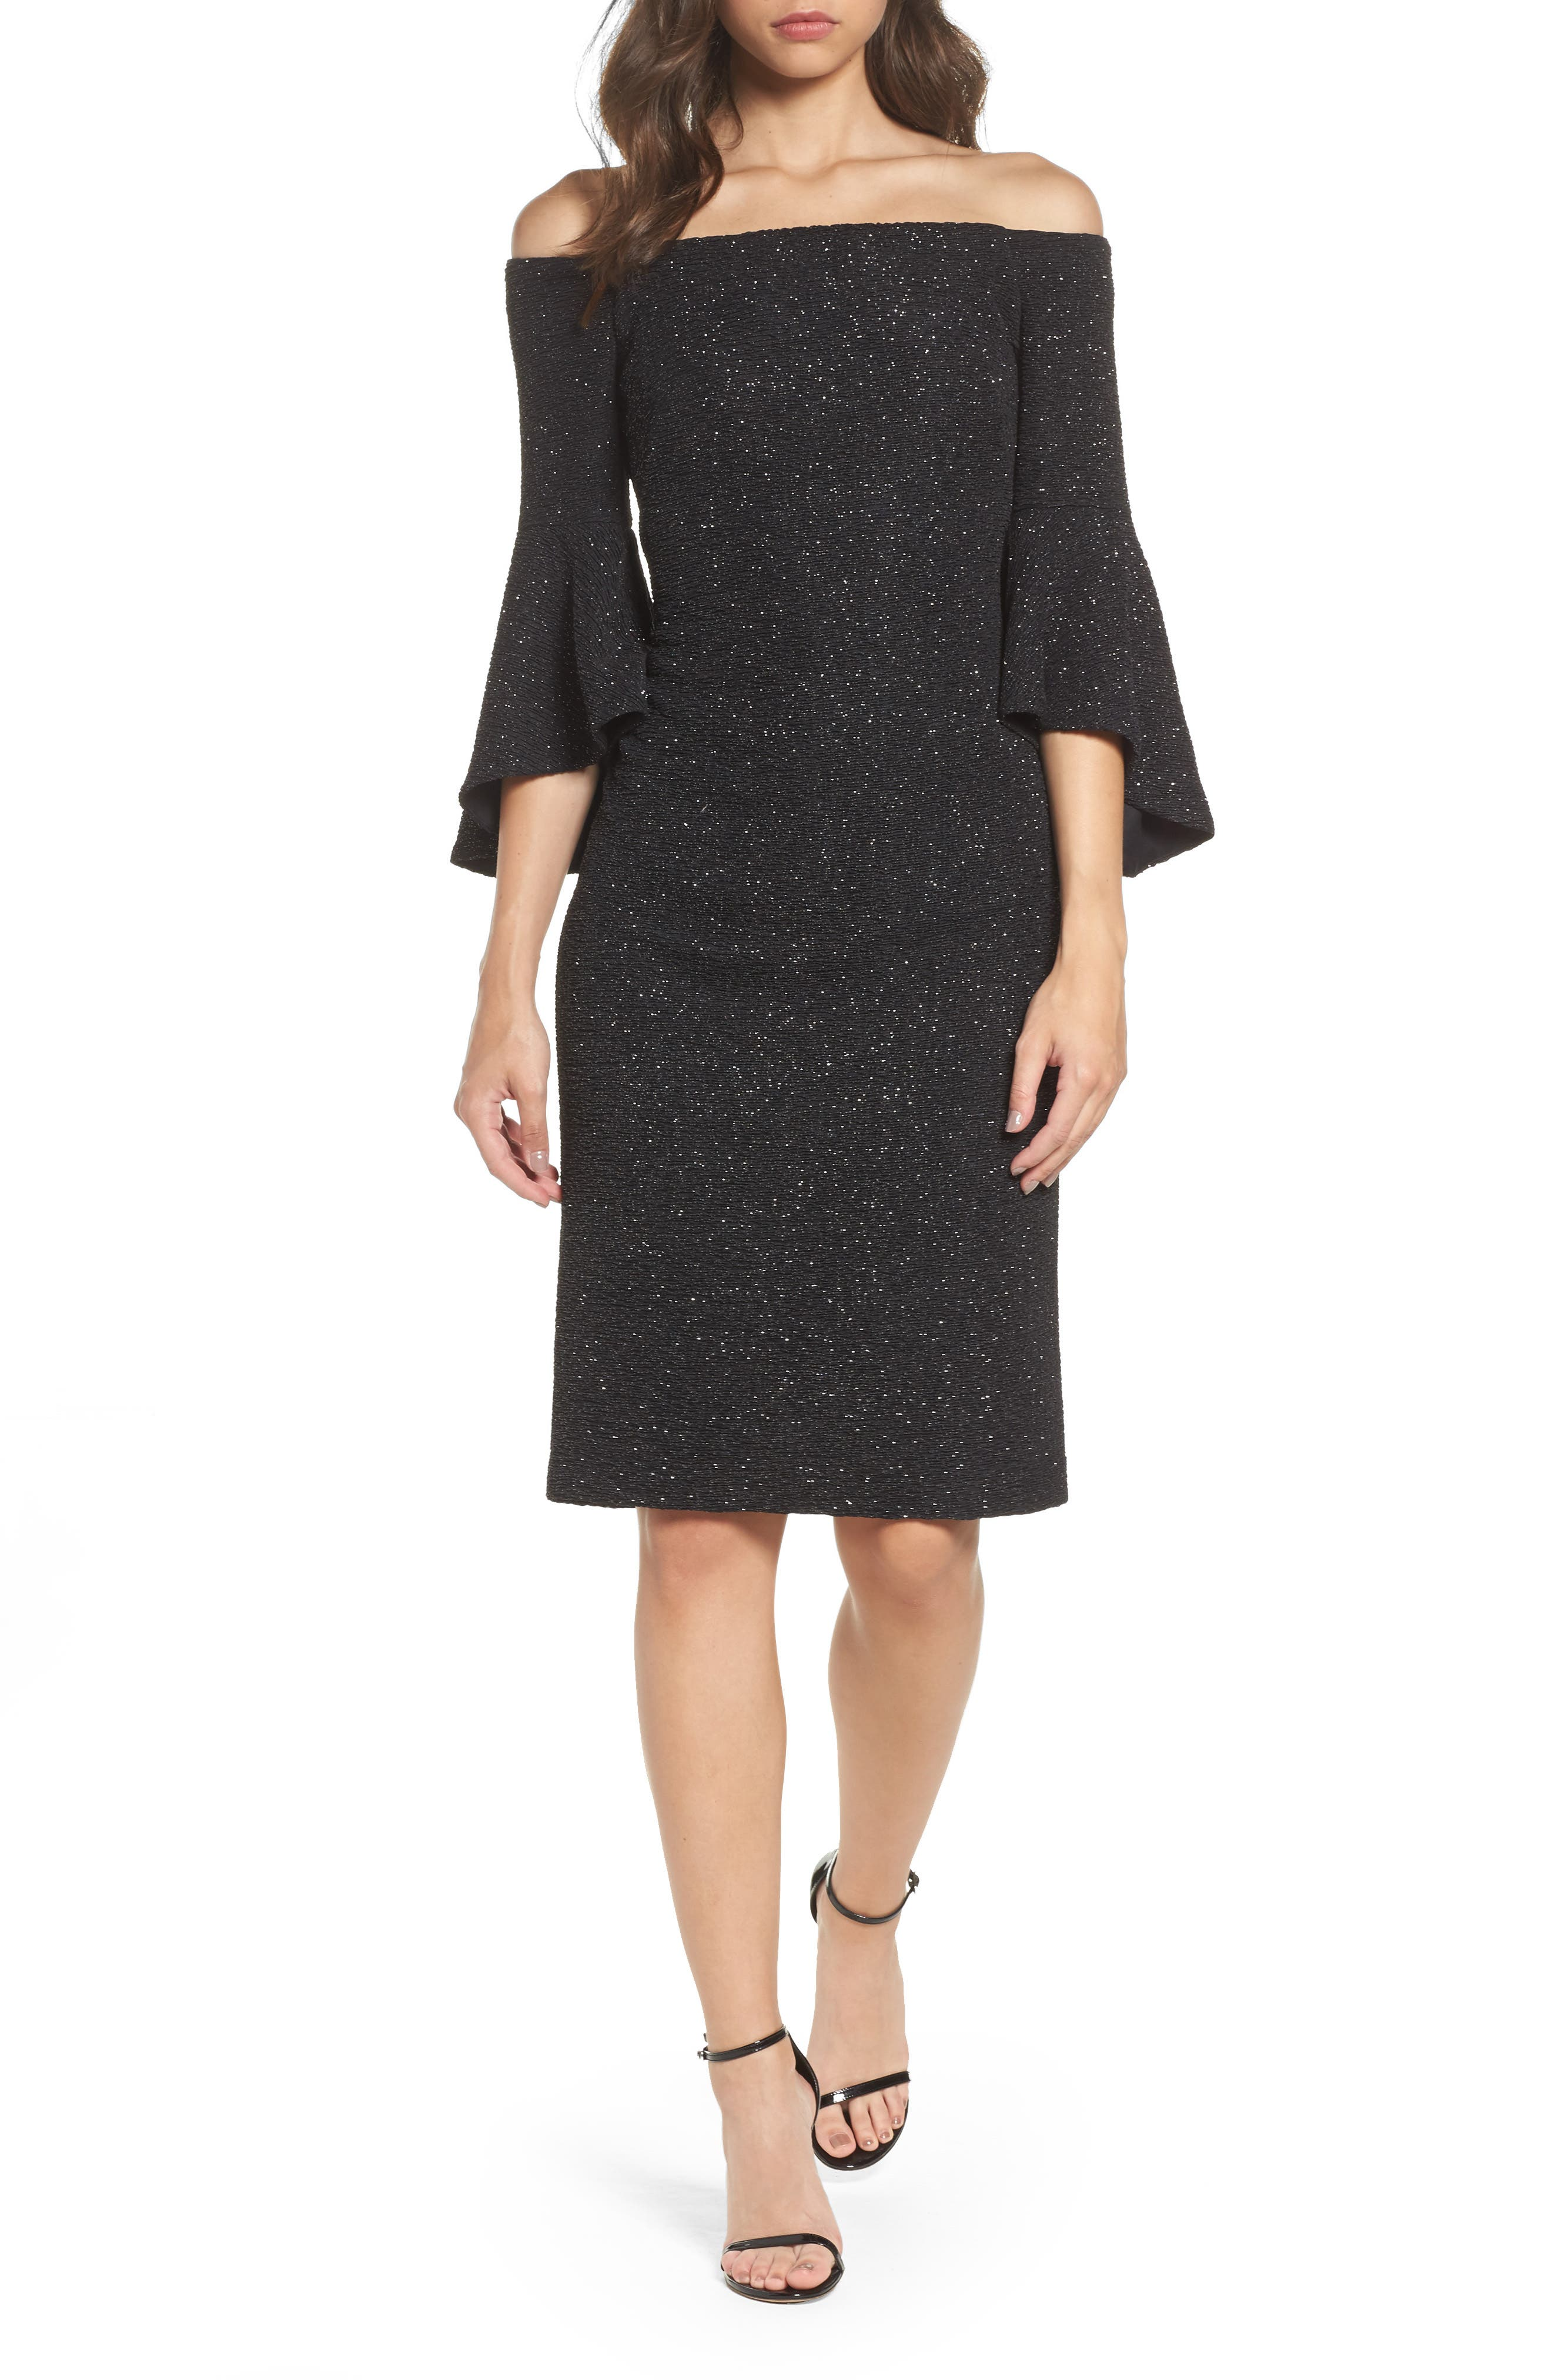 Off the Shoulder Bell Sleeve Sheath Dress,                         Main,                         color, Black/ Silver